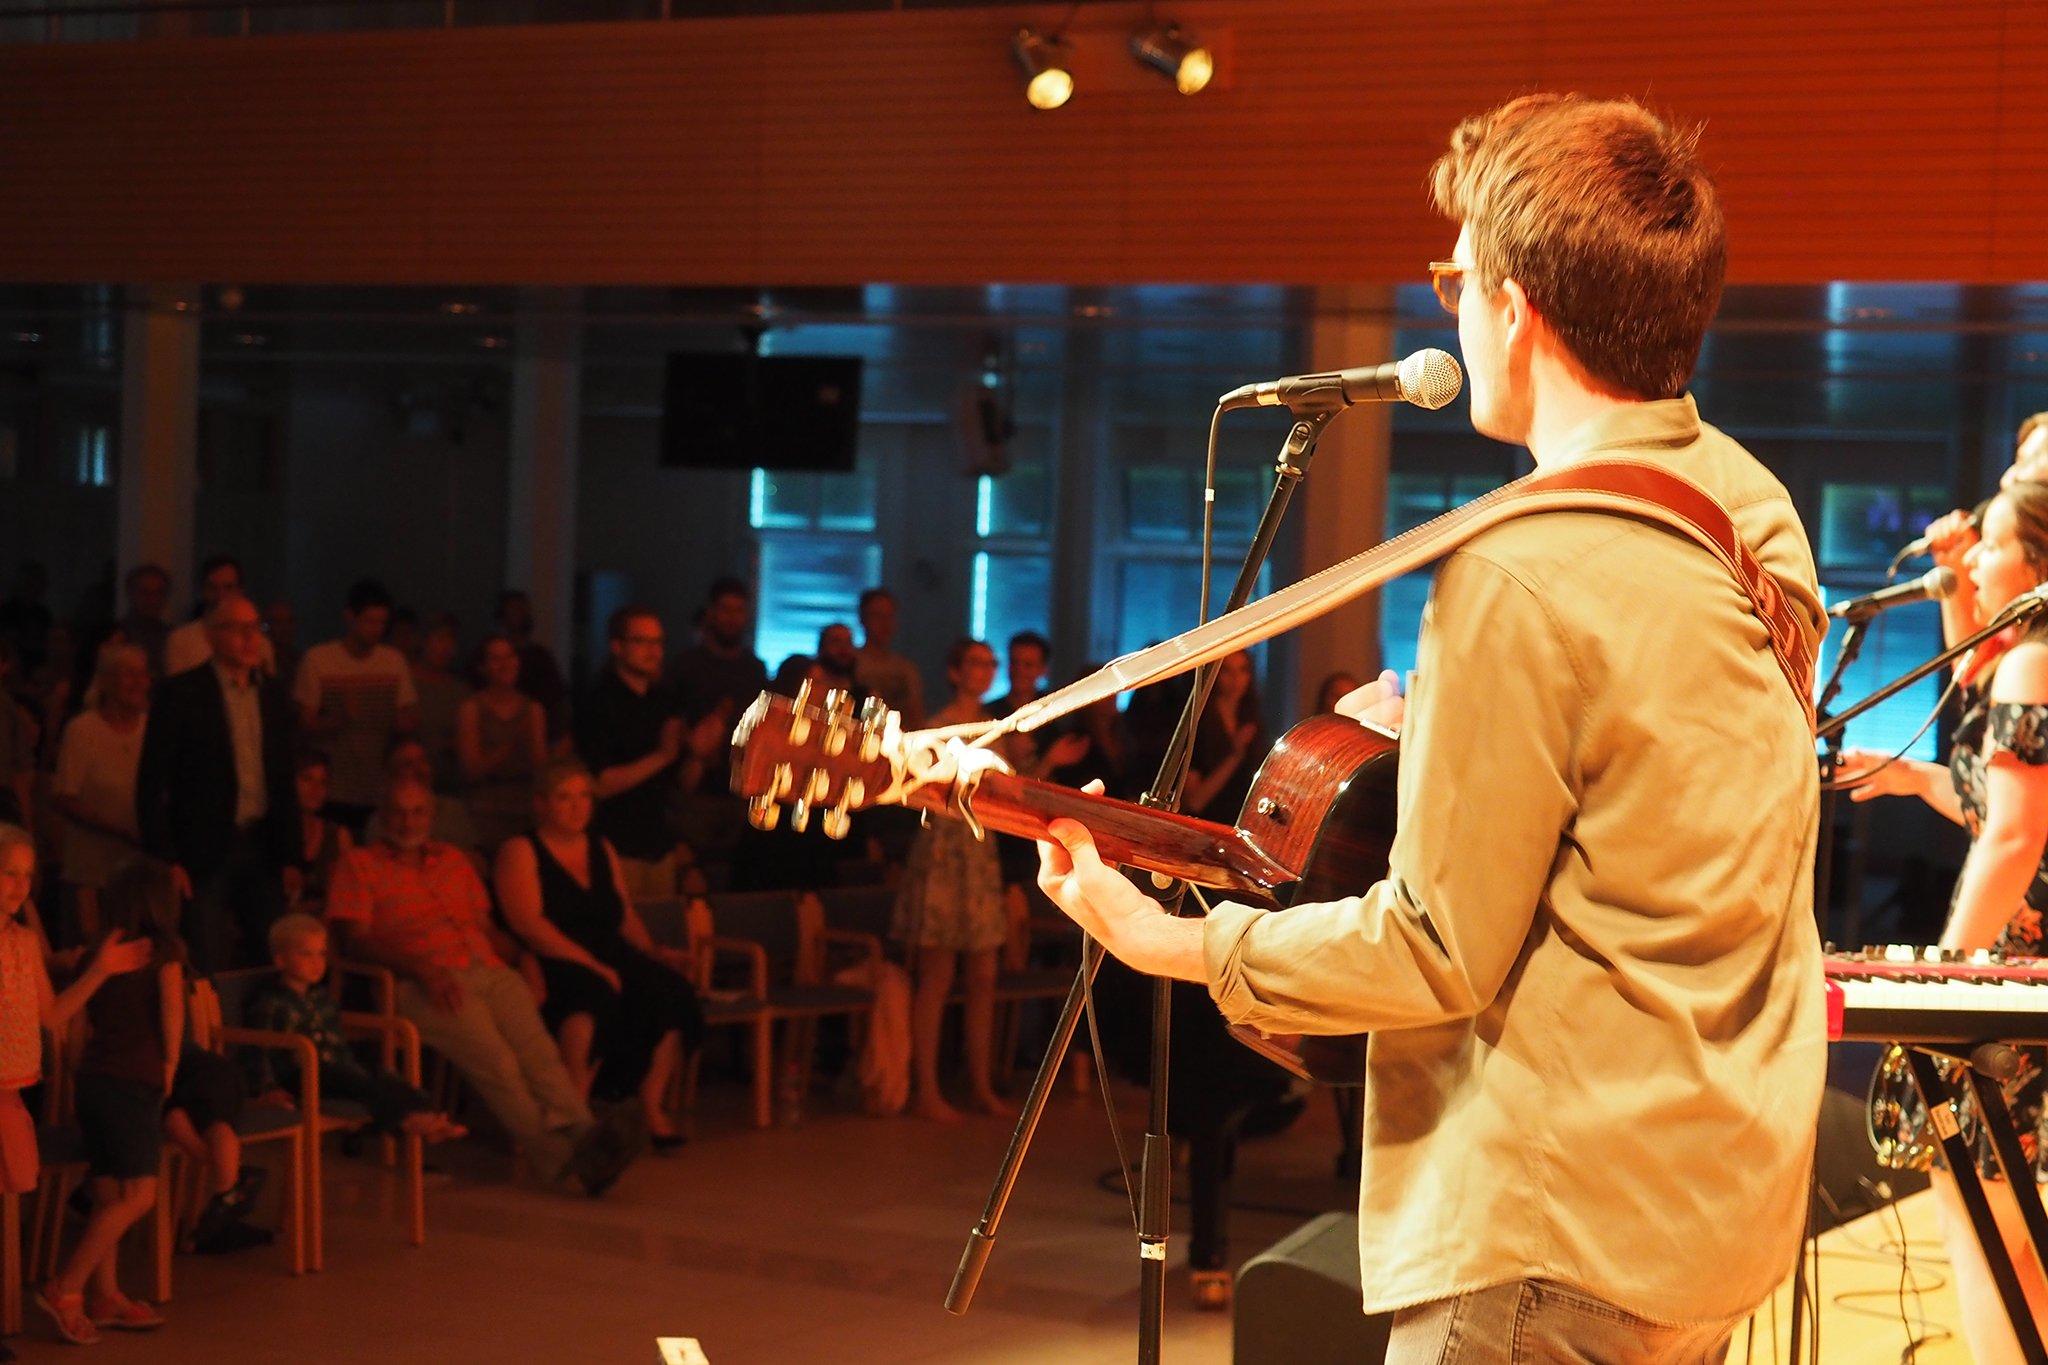 Konzert mit Bands aus dem Studiengang Theologie & Musik